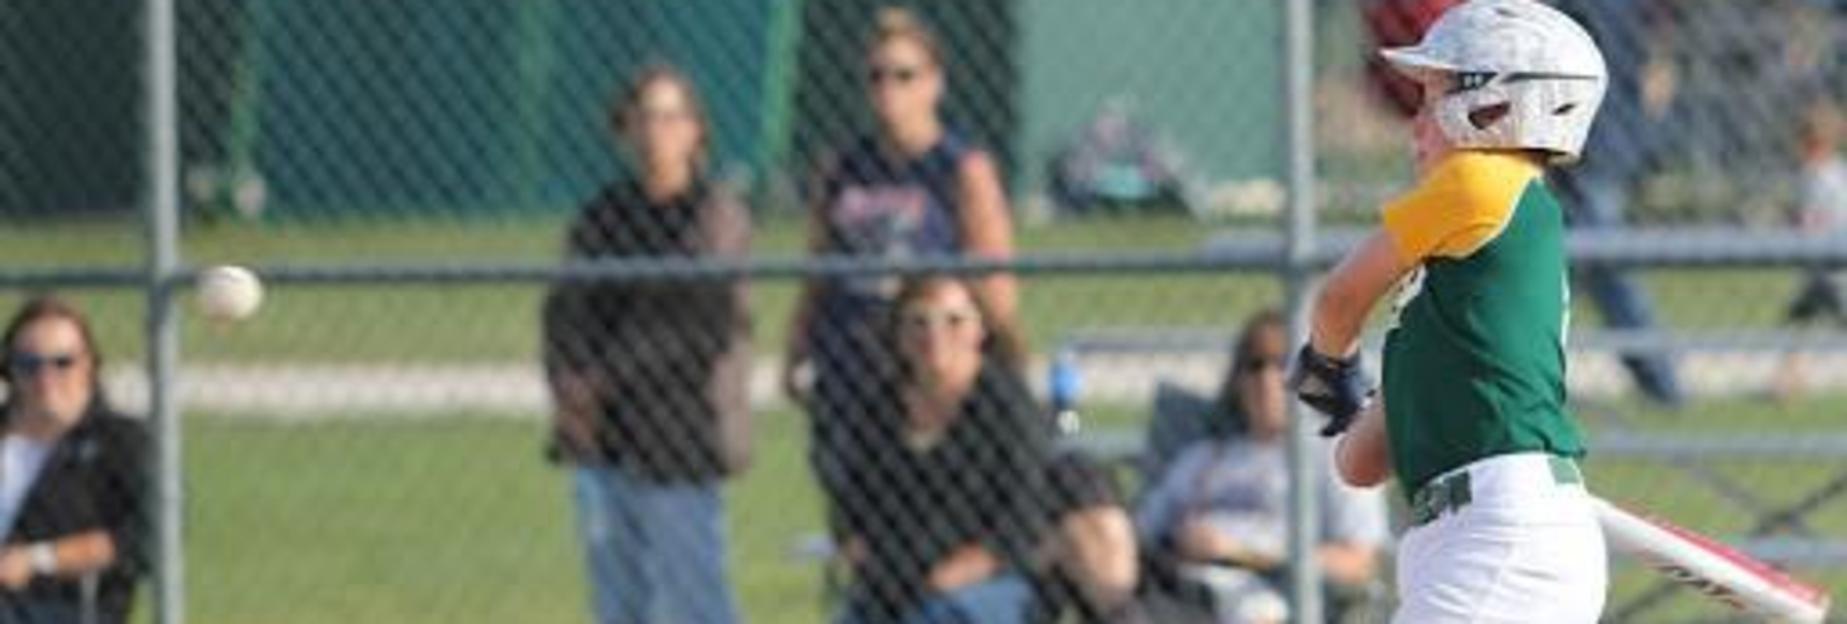 CCMS Baseball B